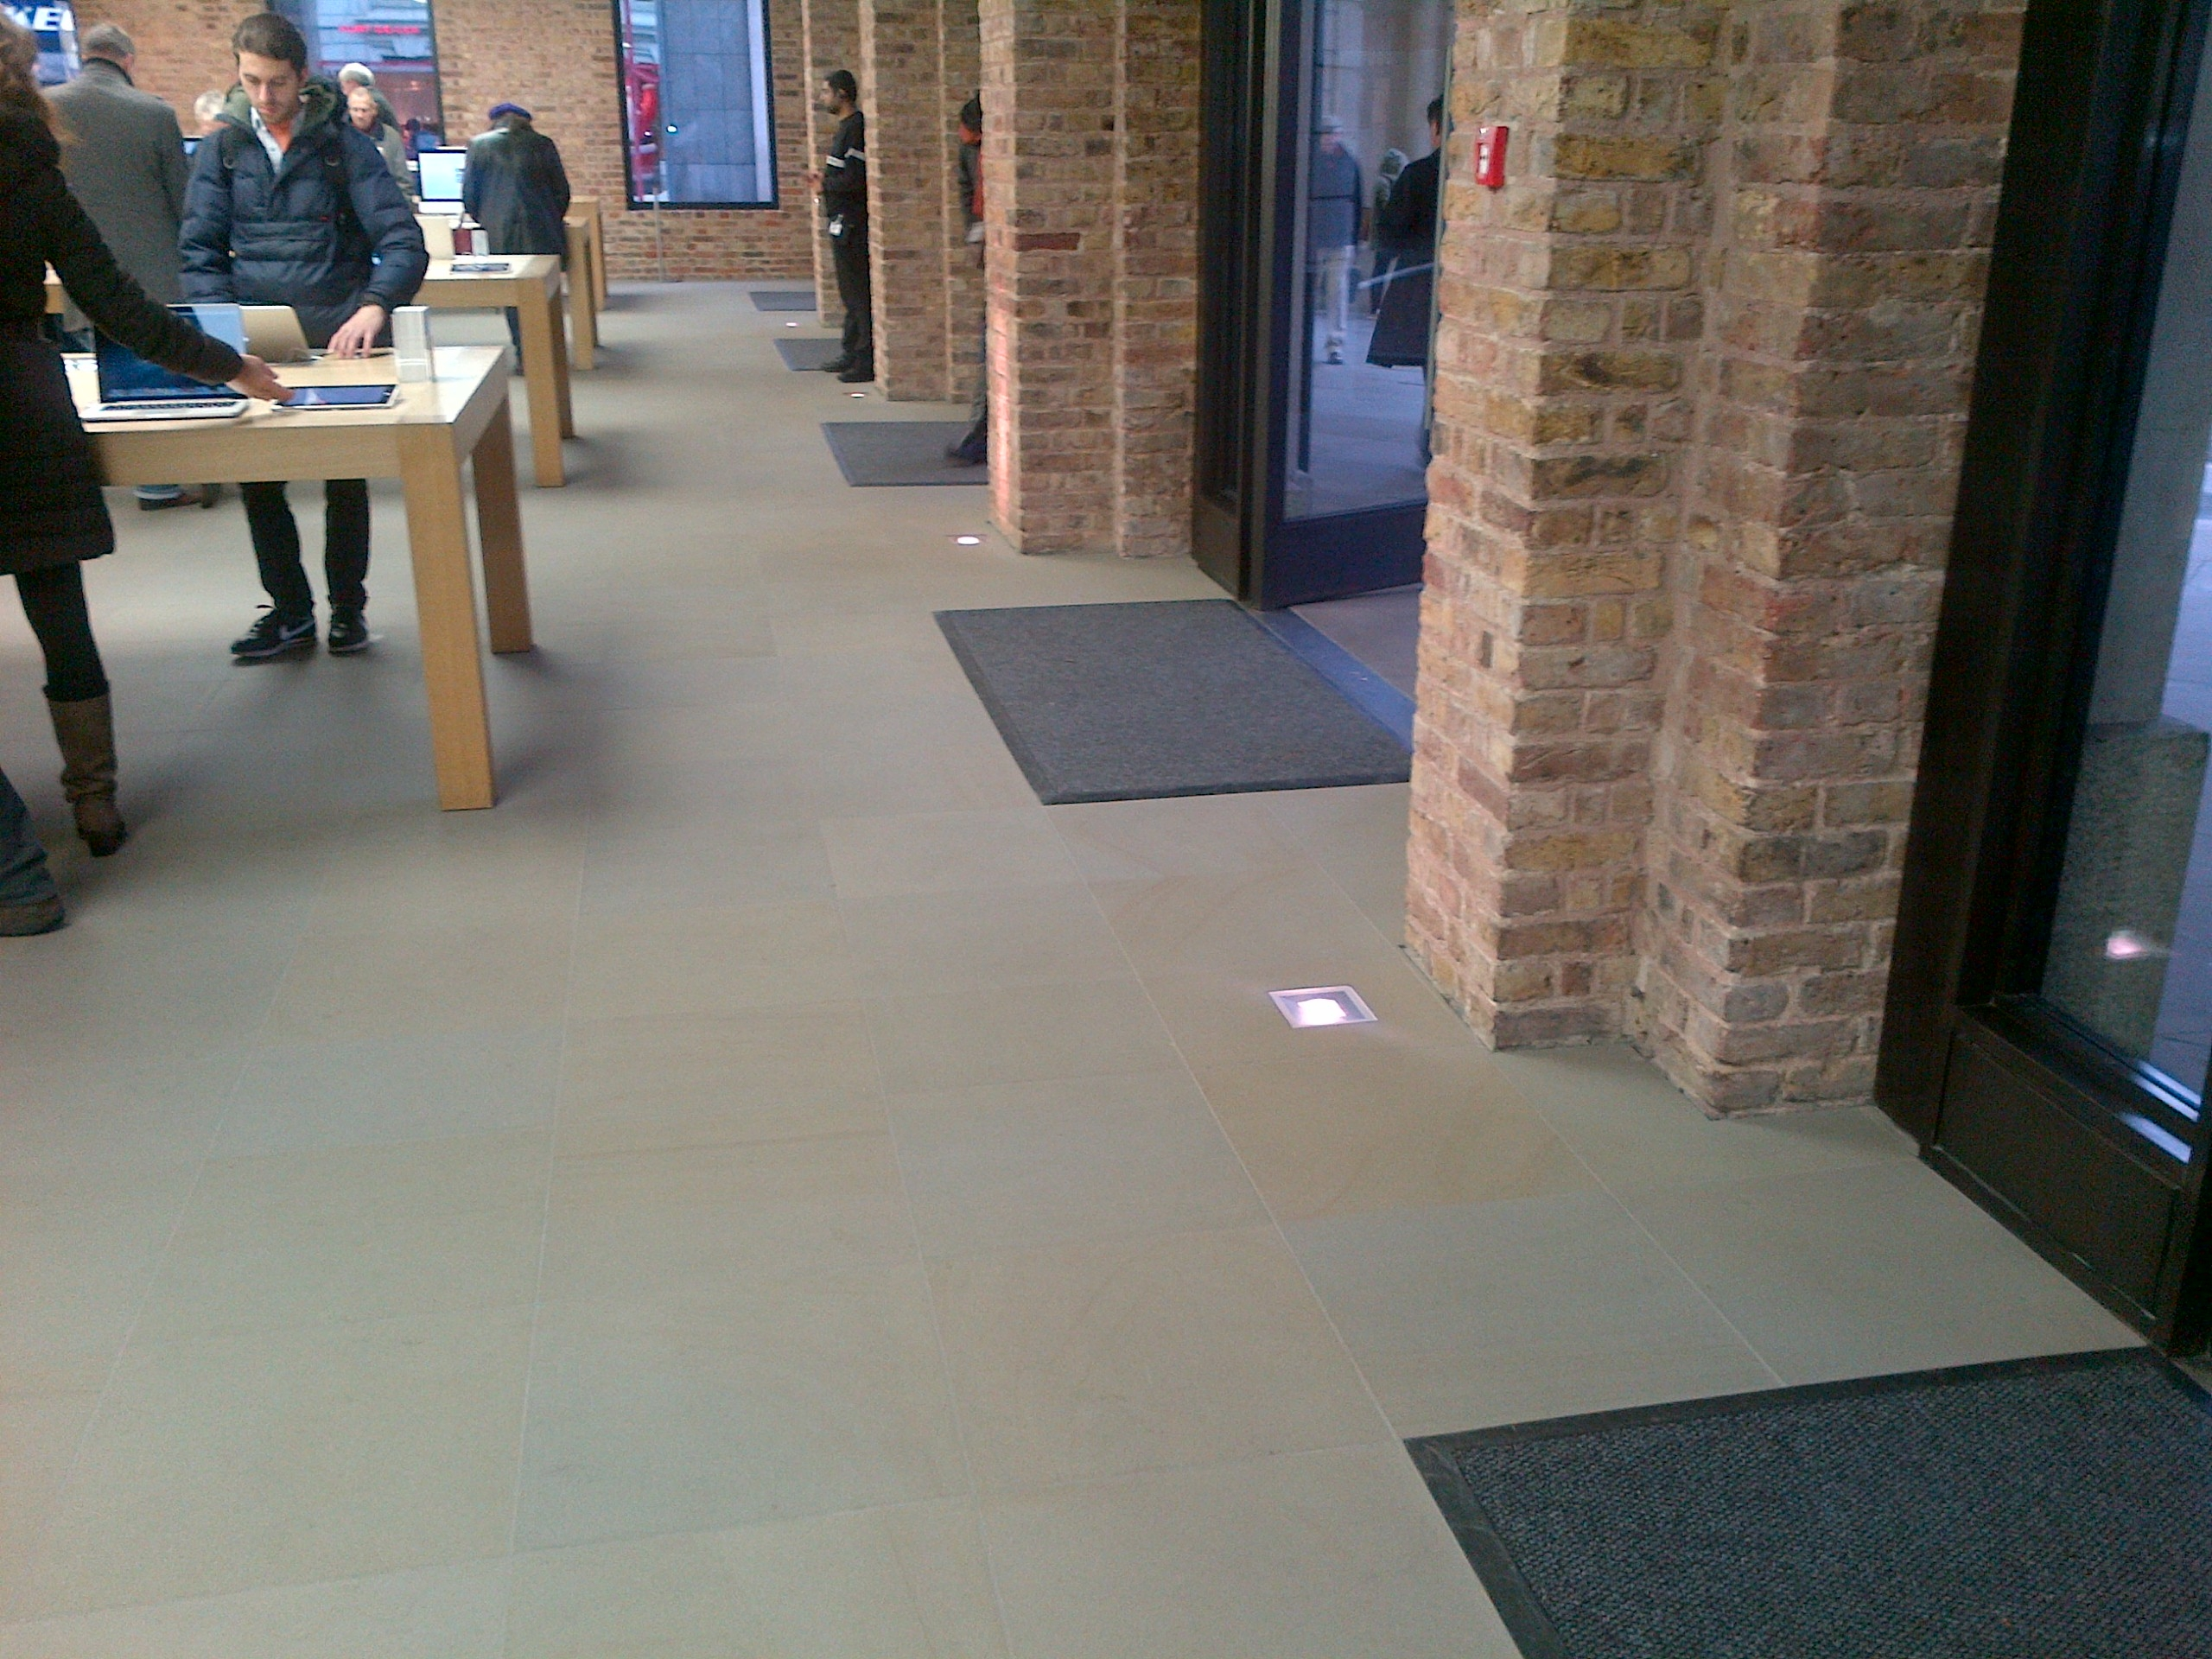 Specialist mats master matting store mats dailygadgetfo Images